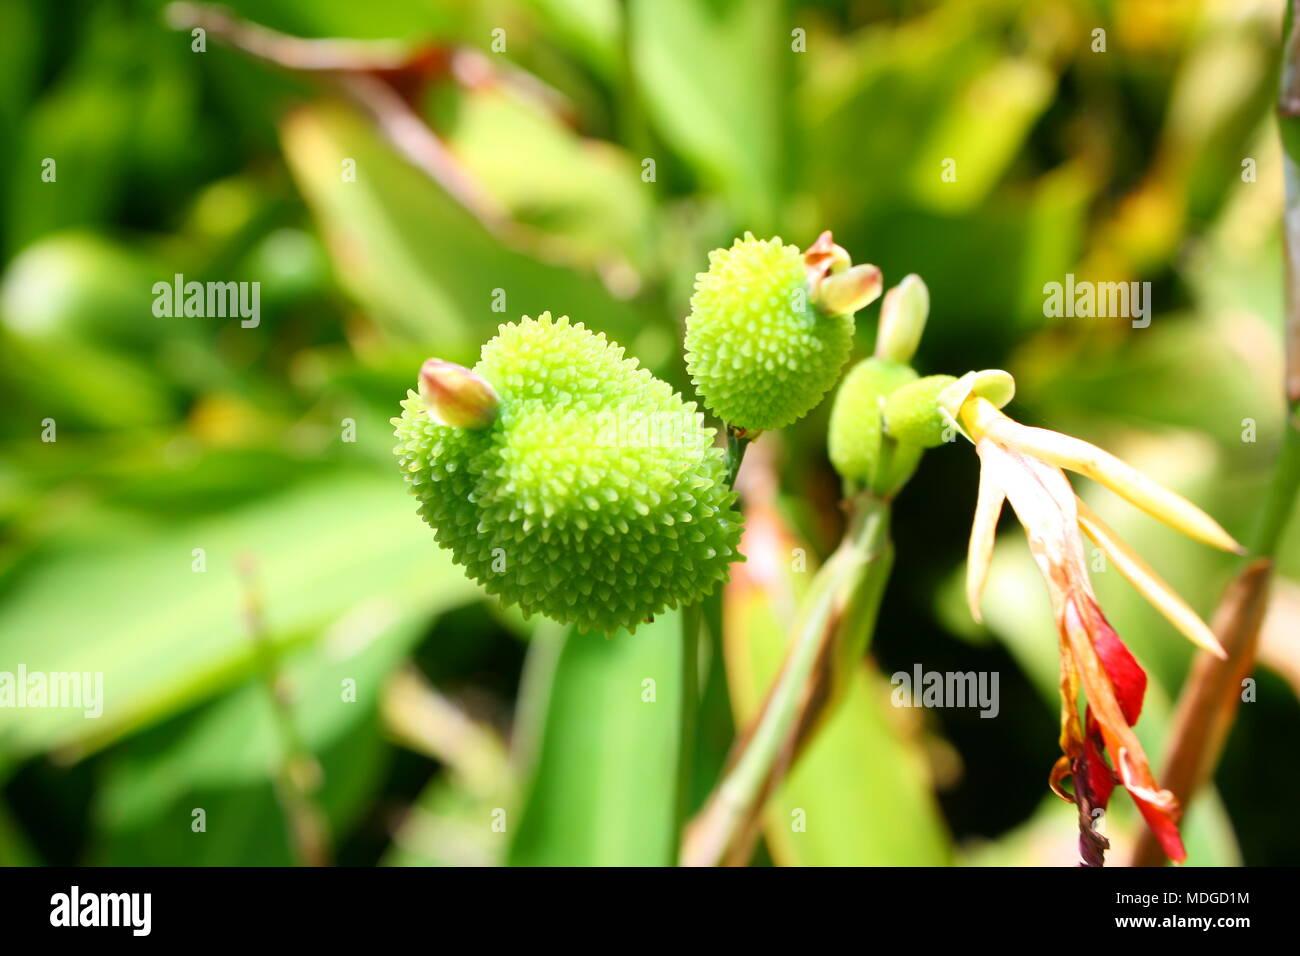 Nature's beauty - Stock Image